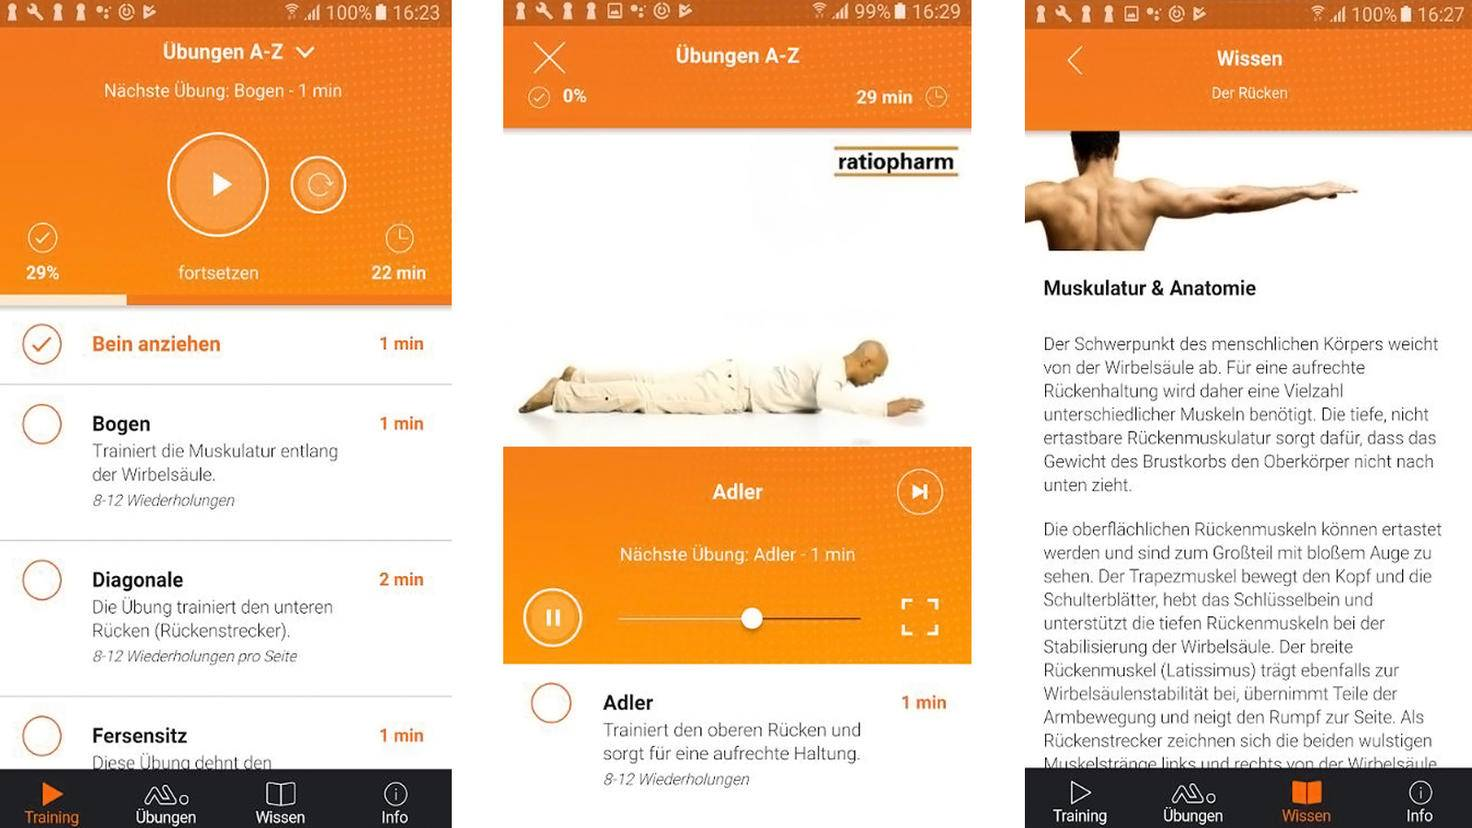 Ratiopharm Rückenschule App-Google Play Store-Ratiopharm GmbH